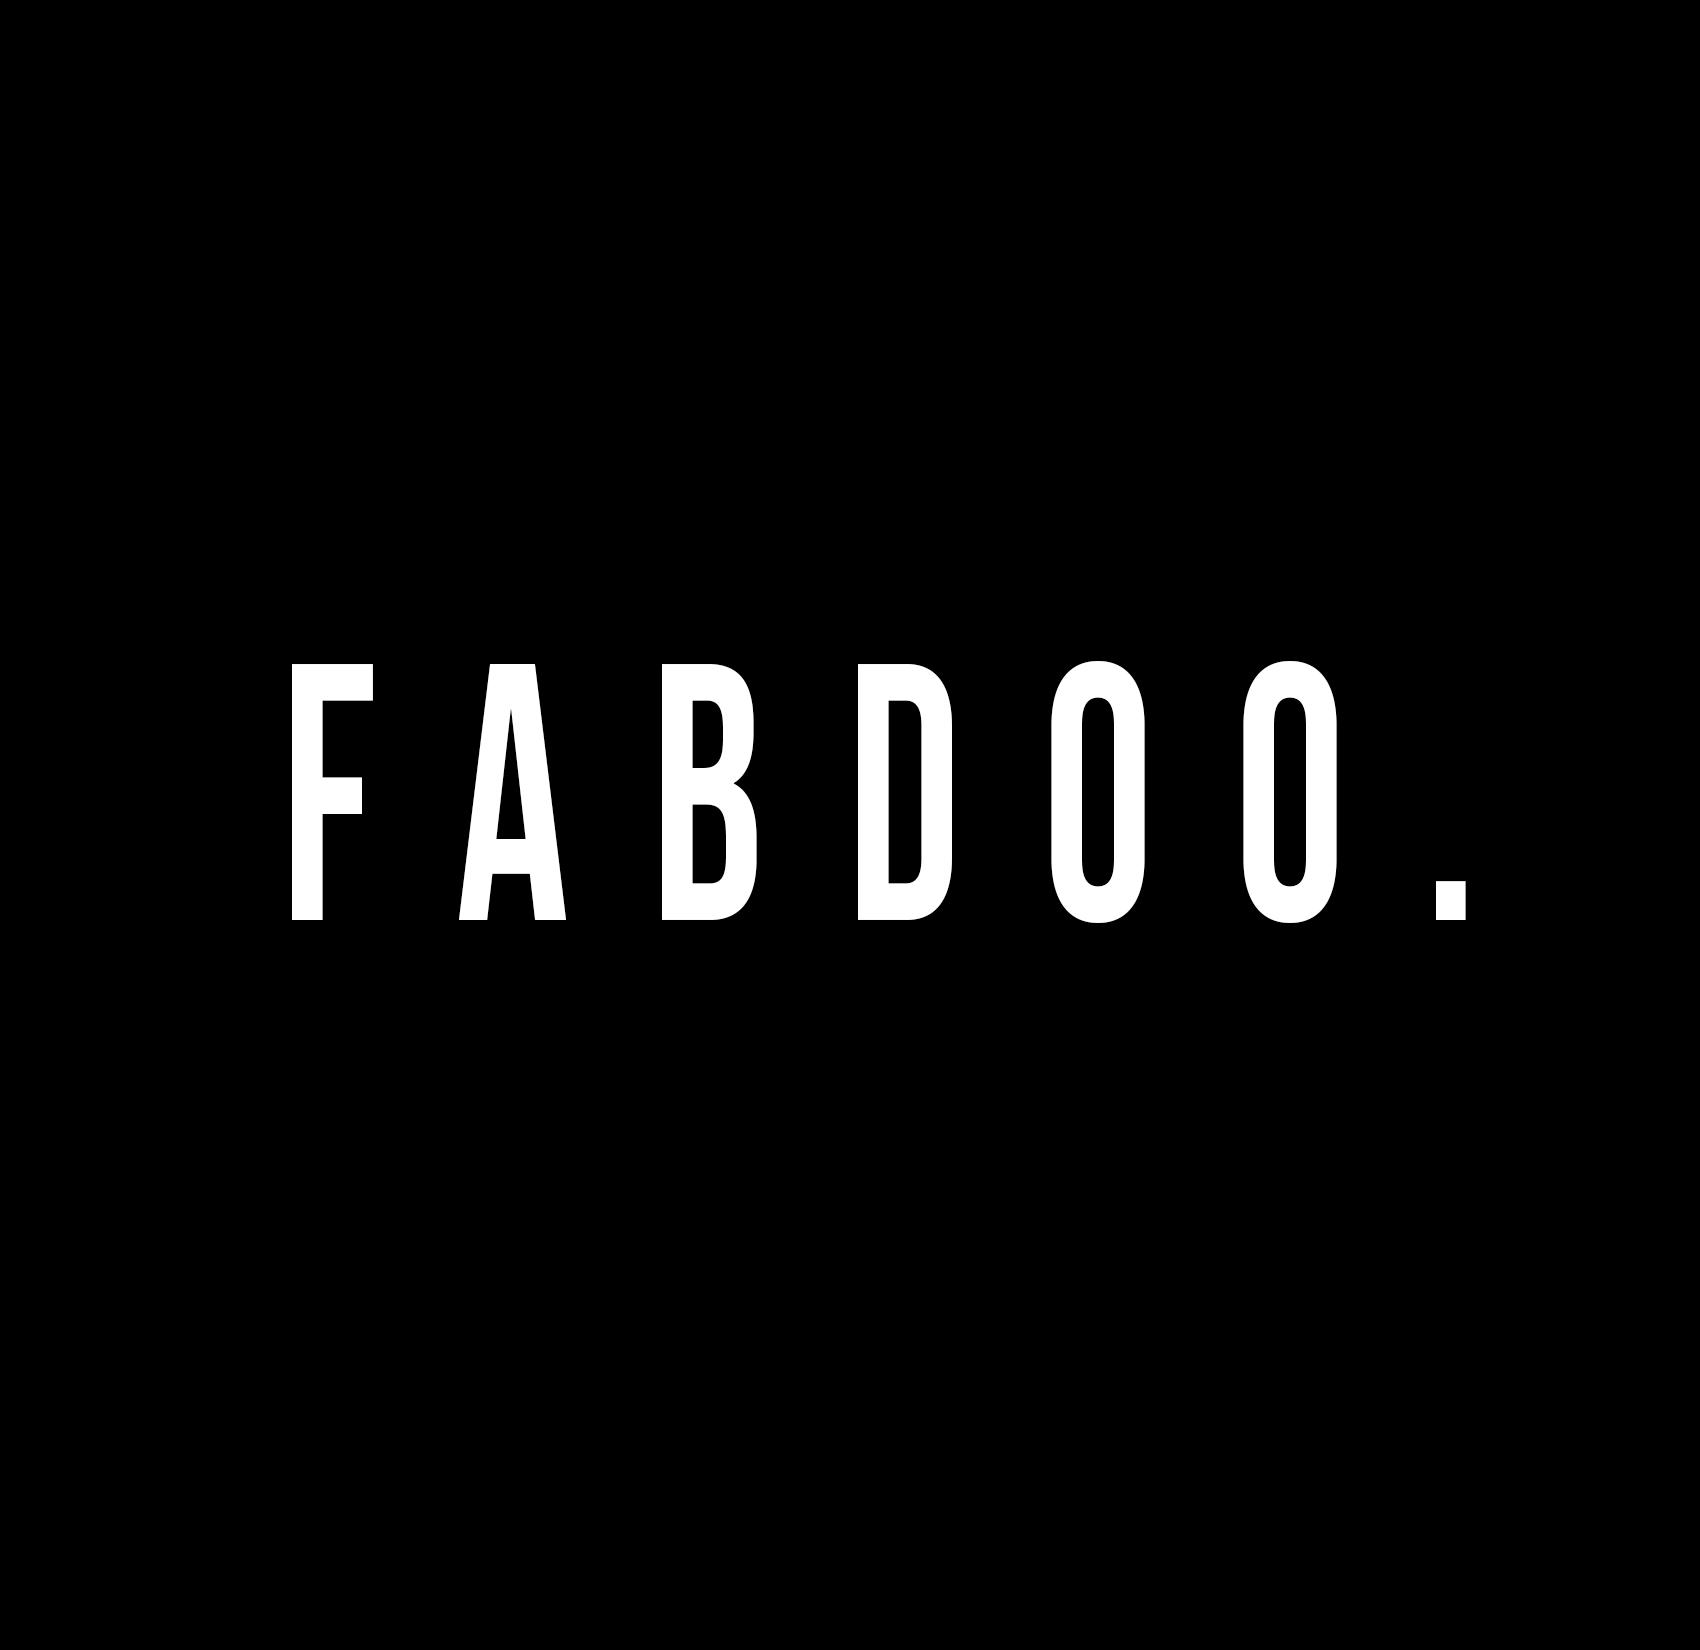 Fabdoo logo